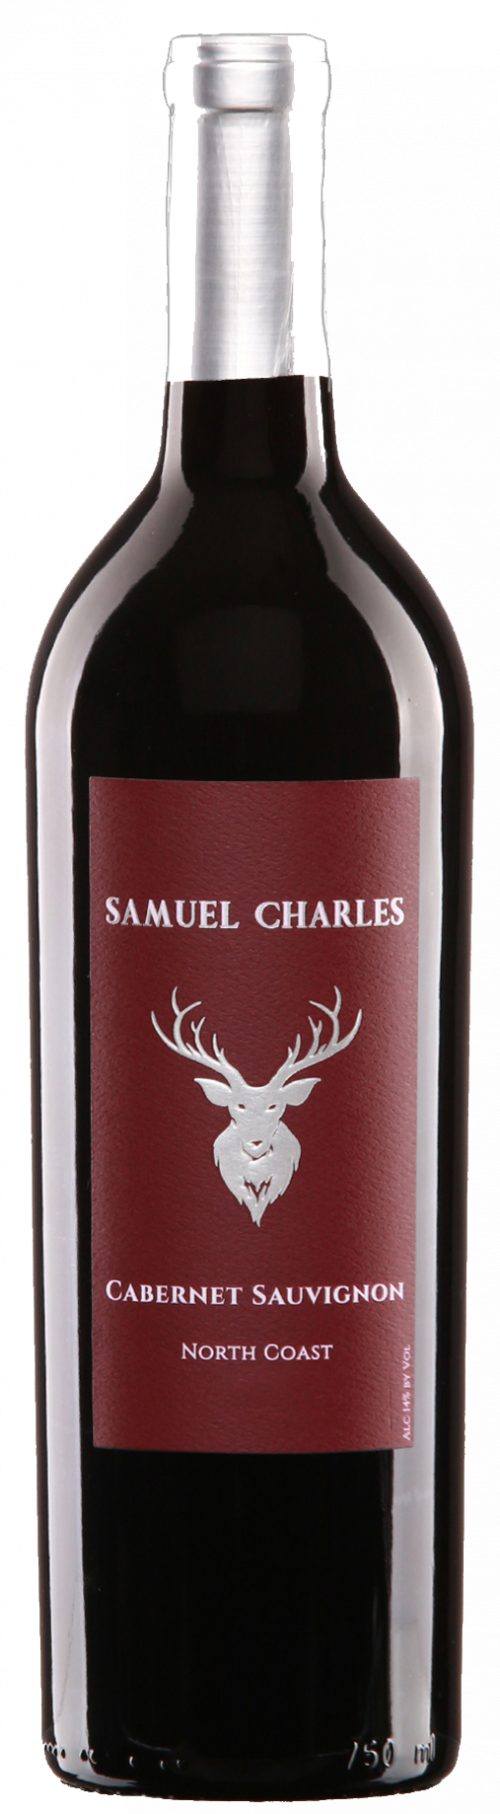 Samuel Charles Cabernet Sauvignon 750ml